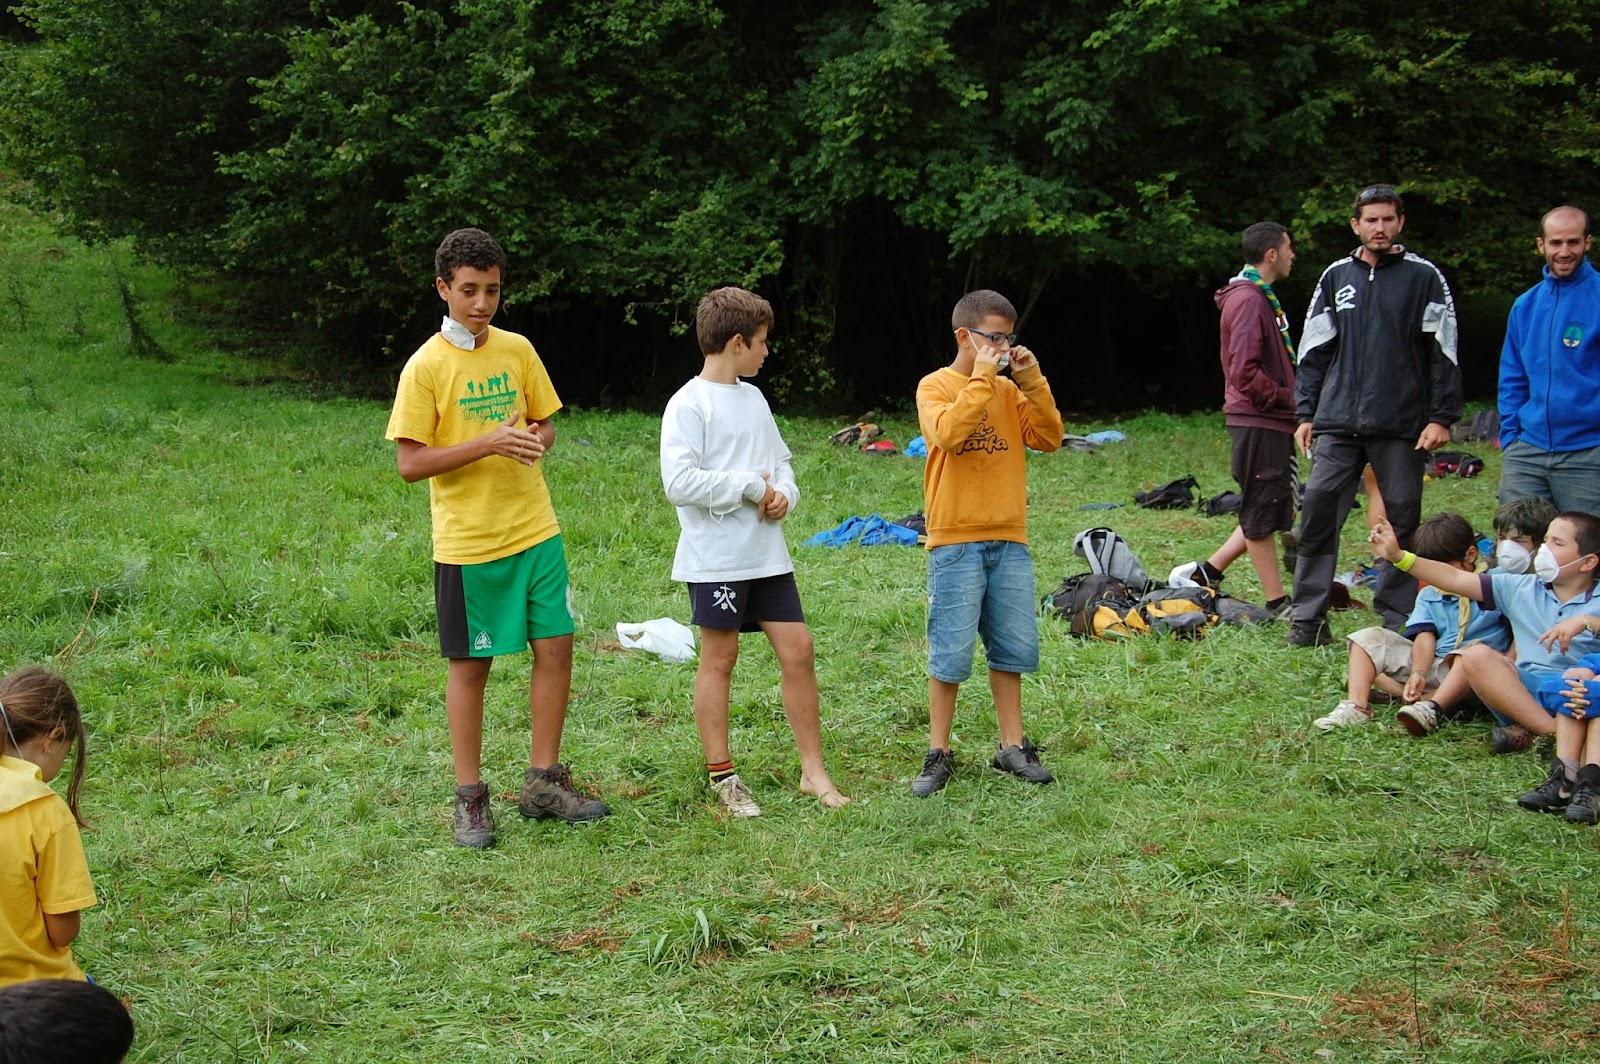 Campaments Estiu RolandKing 2011 - DSC_0219%2B2.JPG